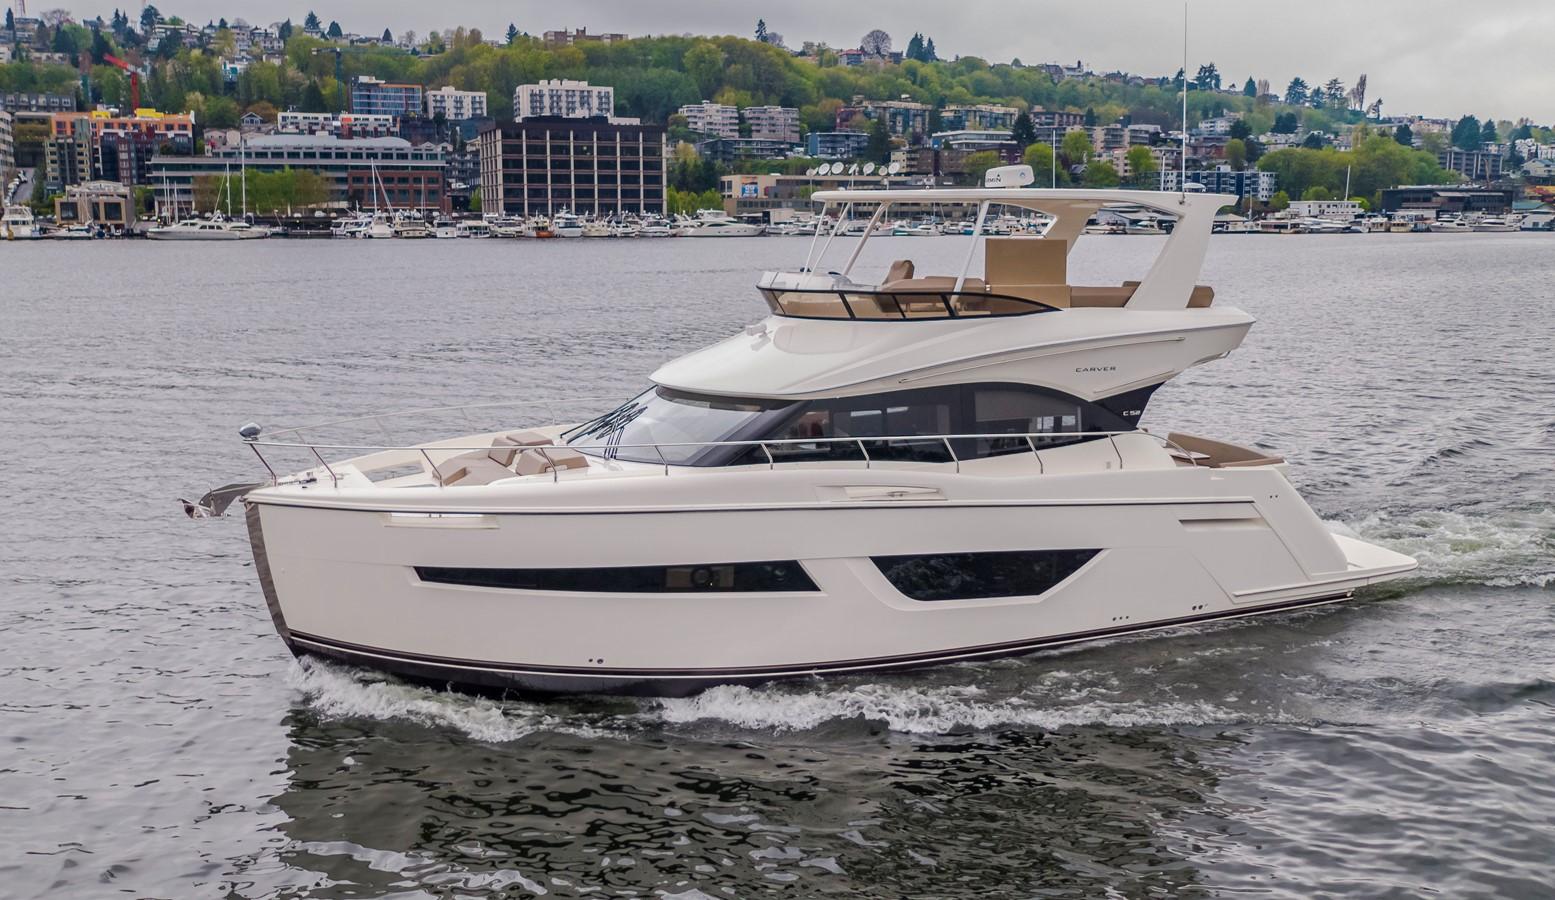 2019 CARVER C52 Motor Yacht 2520777